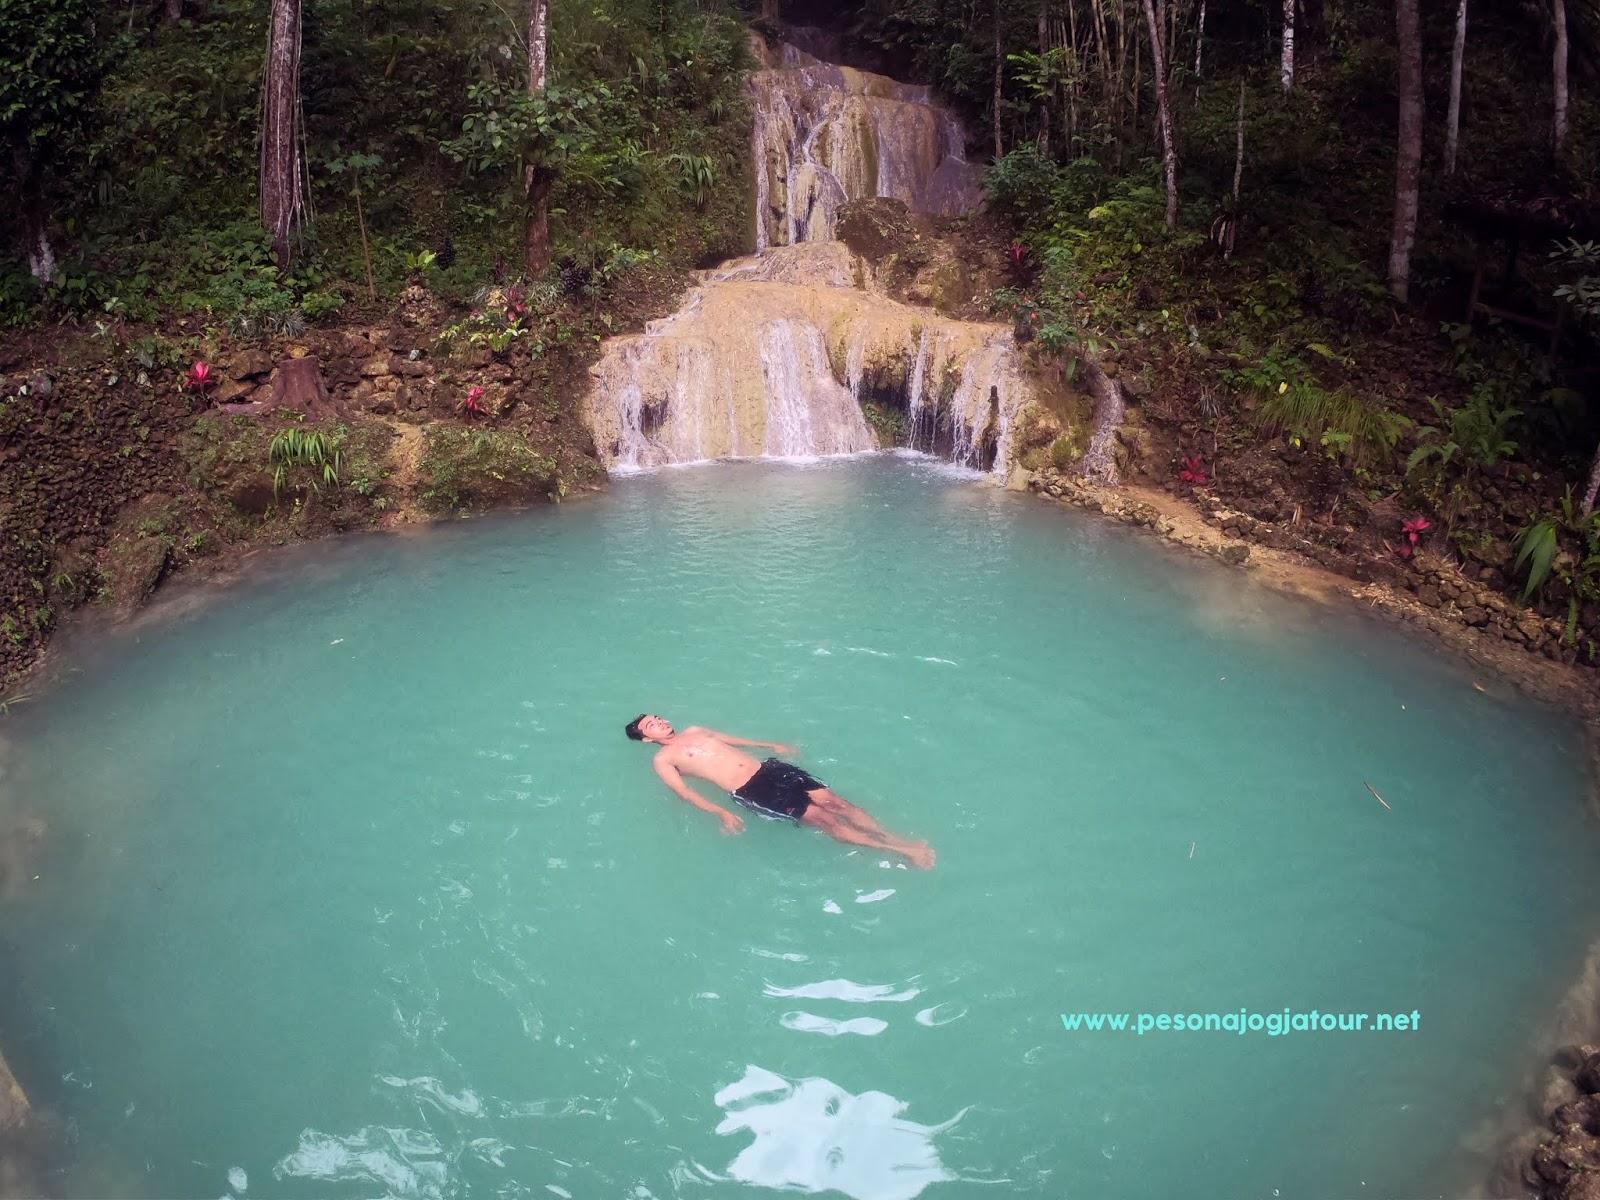 Air terjun Kuncung Mas